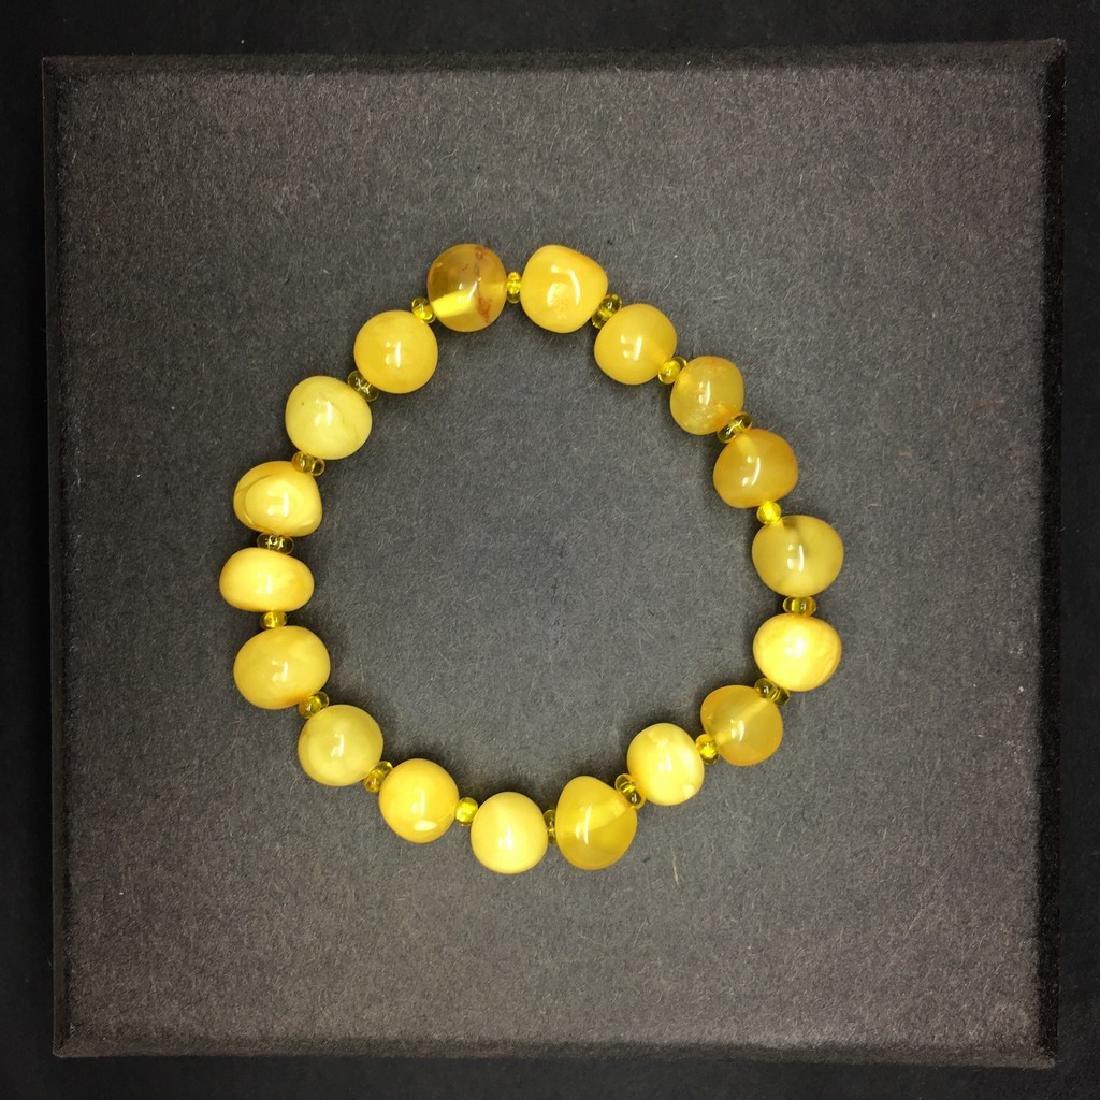 Bracelet amber  baroque hand-polished beads 8,6g - 3